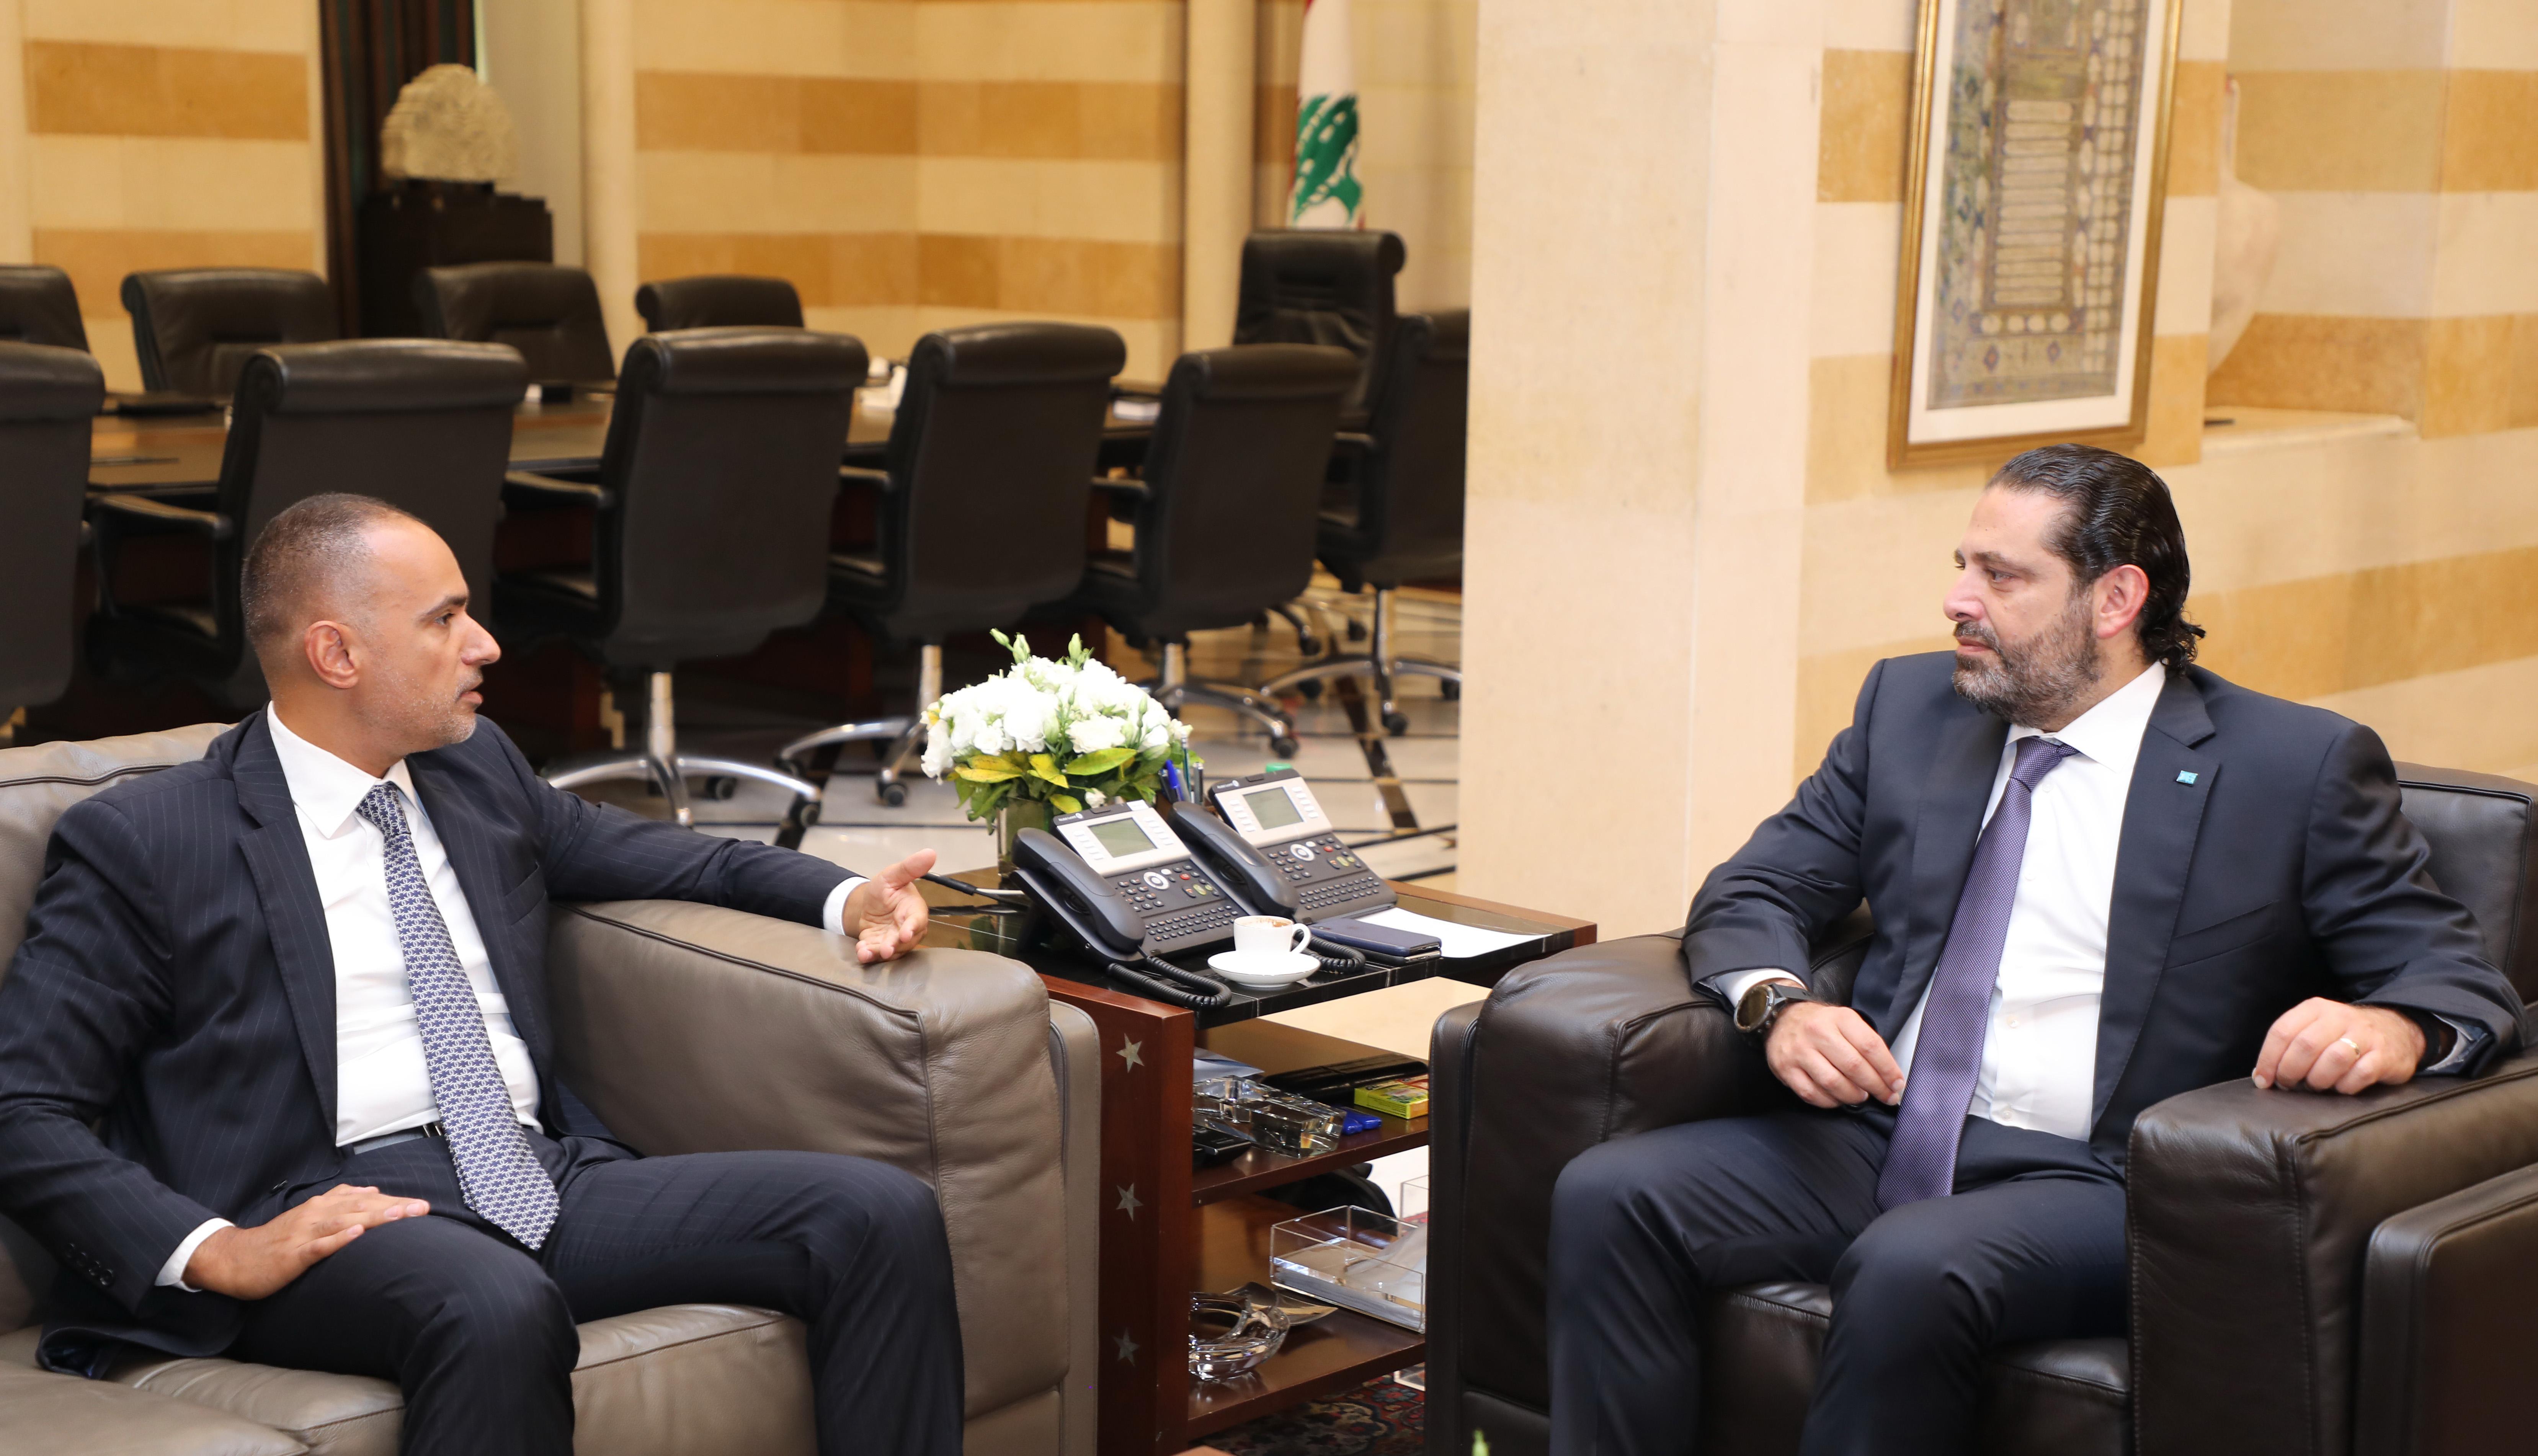 Pr Minister Saad Hariri meets Mr Mazen Soueid